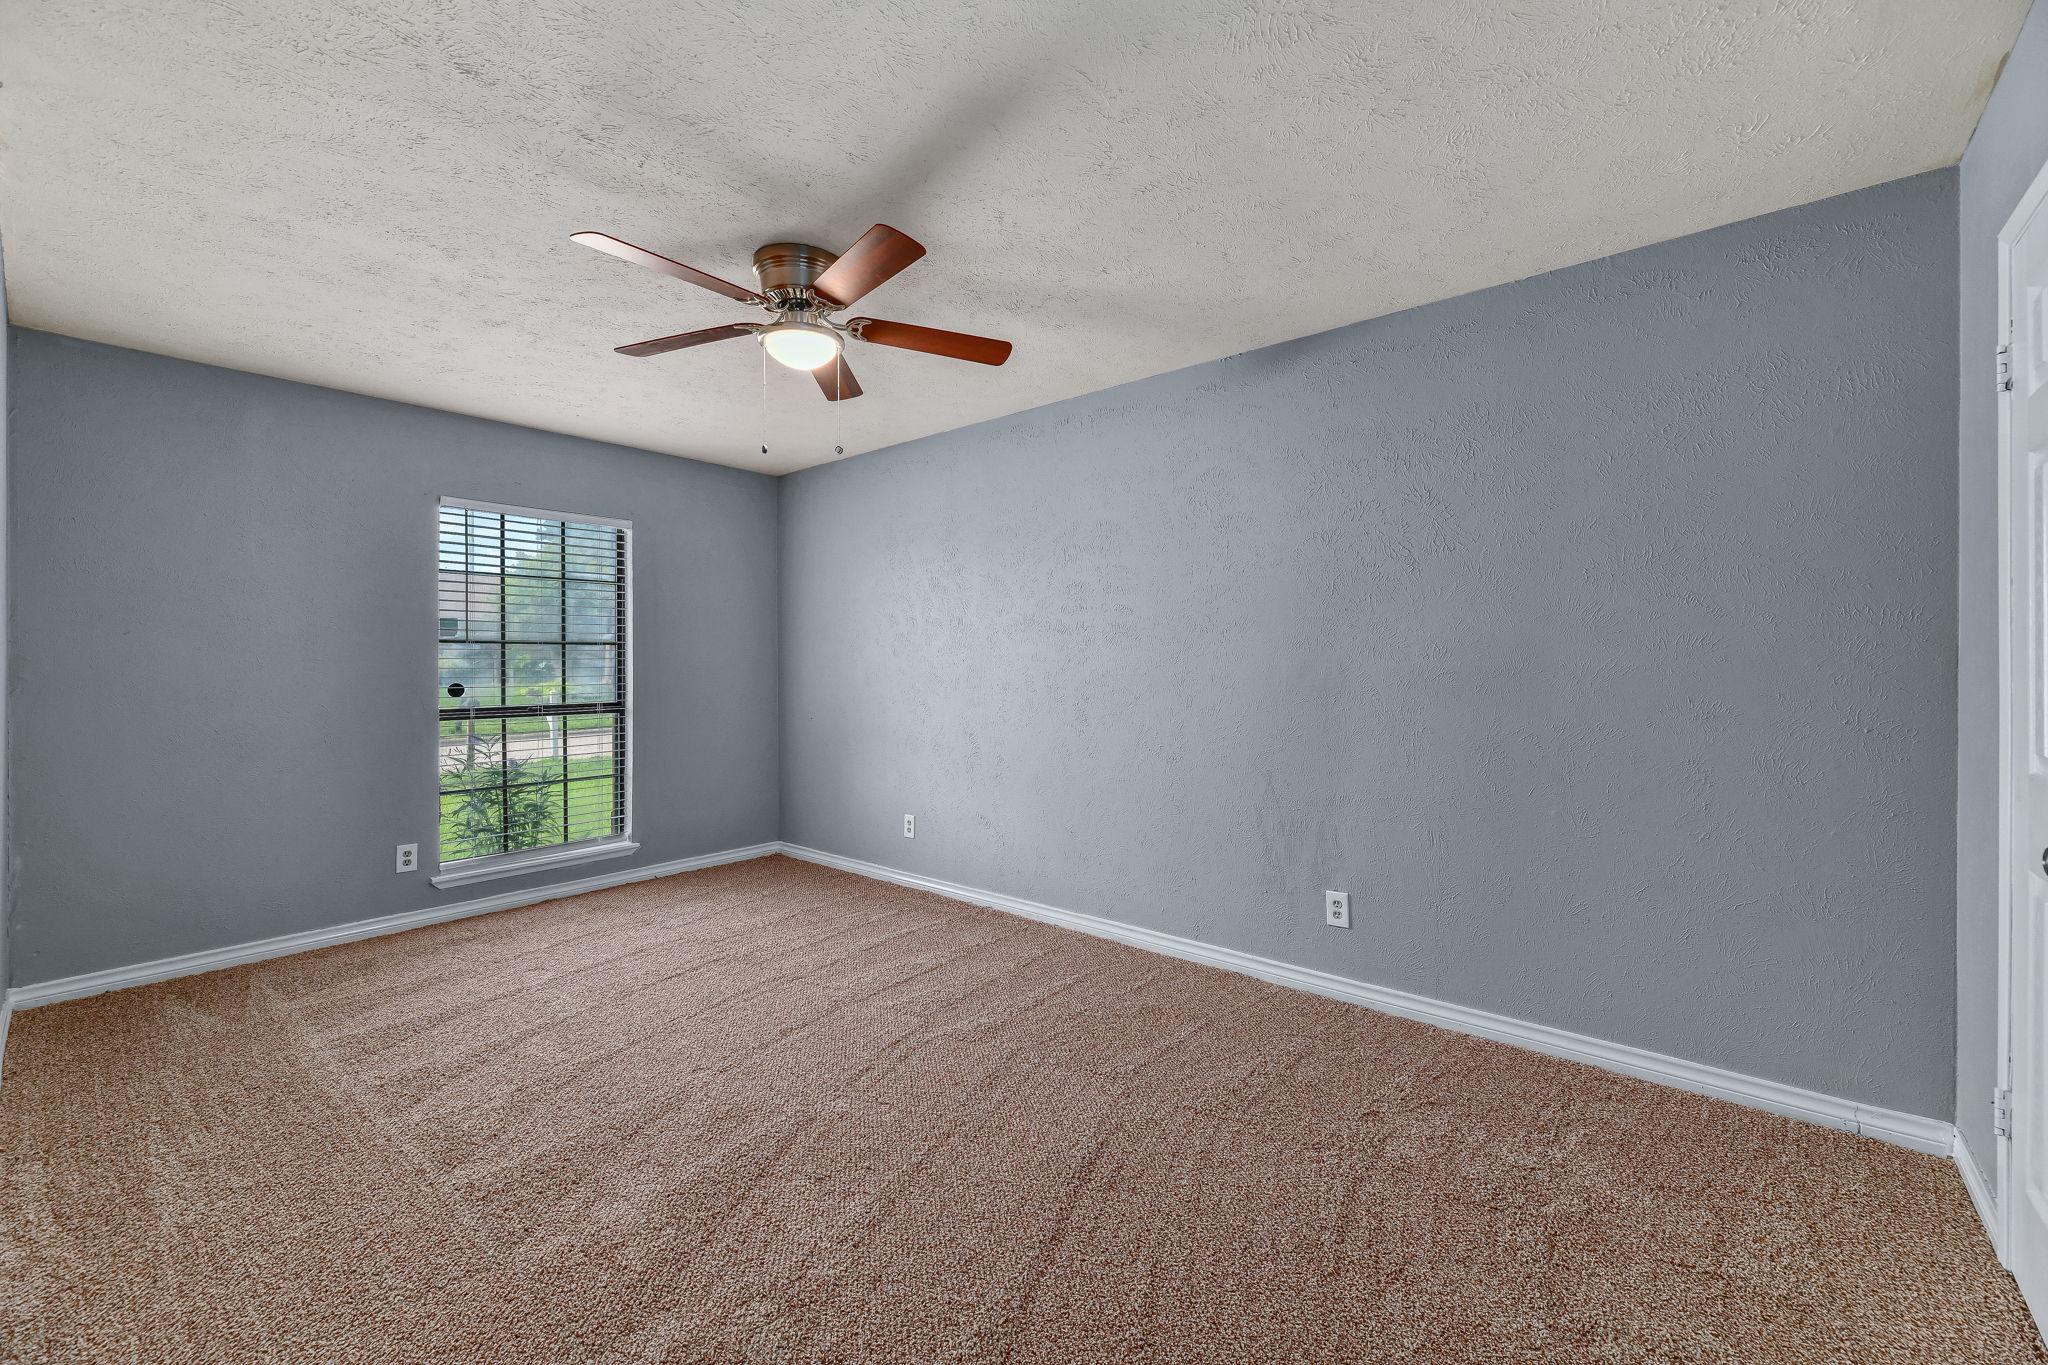 017-Bedroom 2-FULL